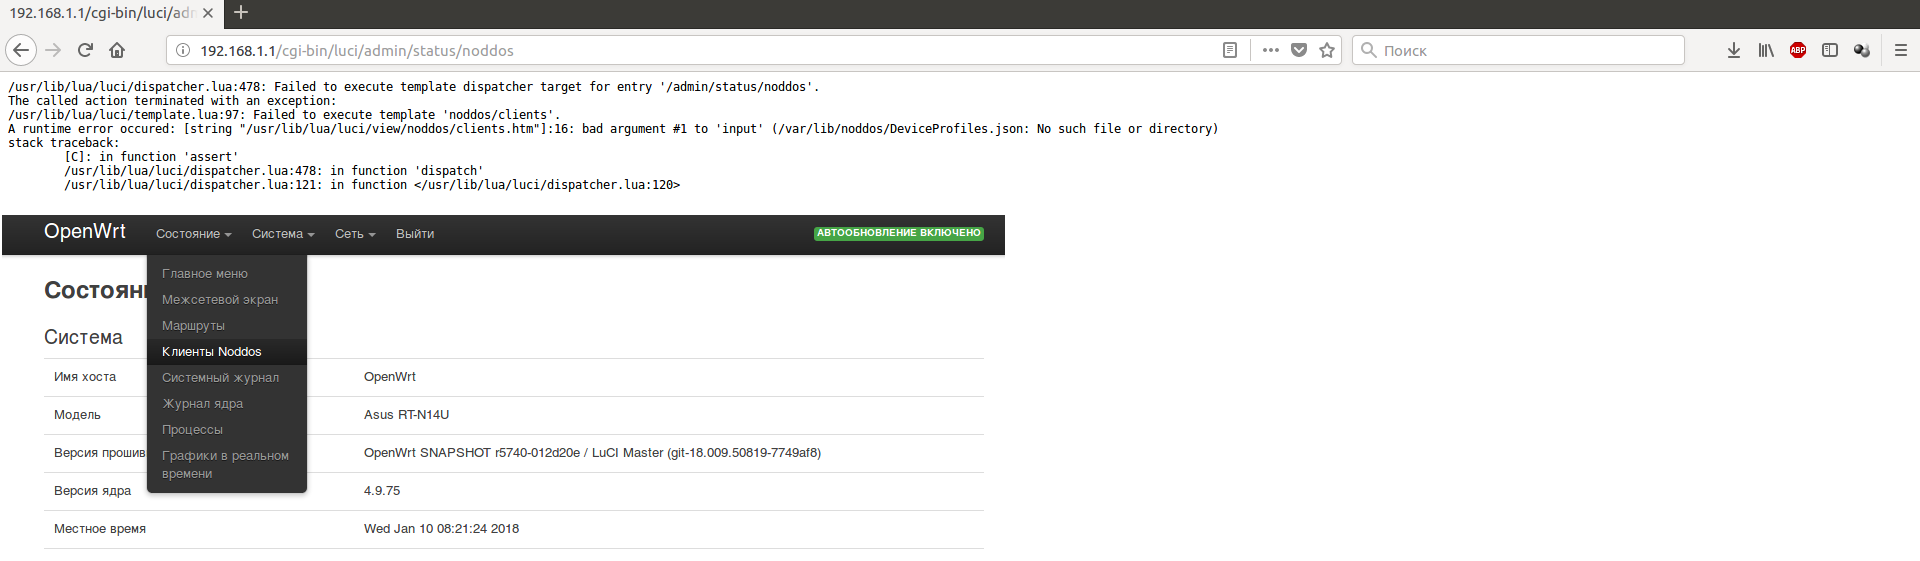 luci-app-noddos bug · Issue #1535 · openwrt/luci · GitHub